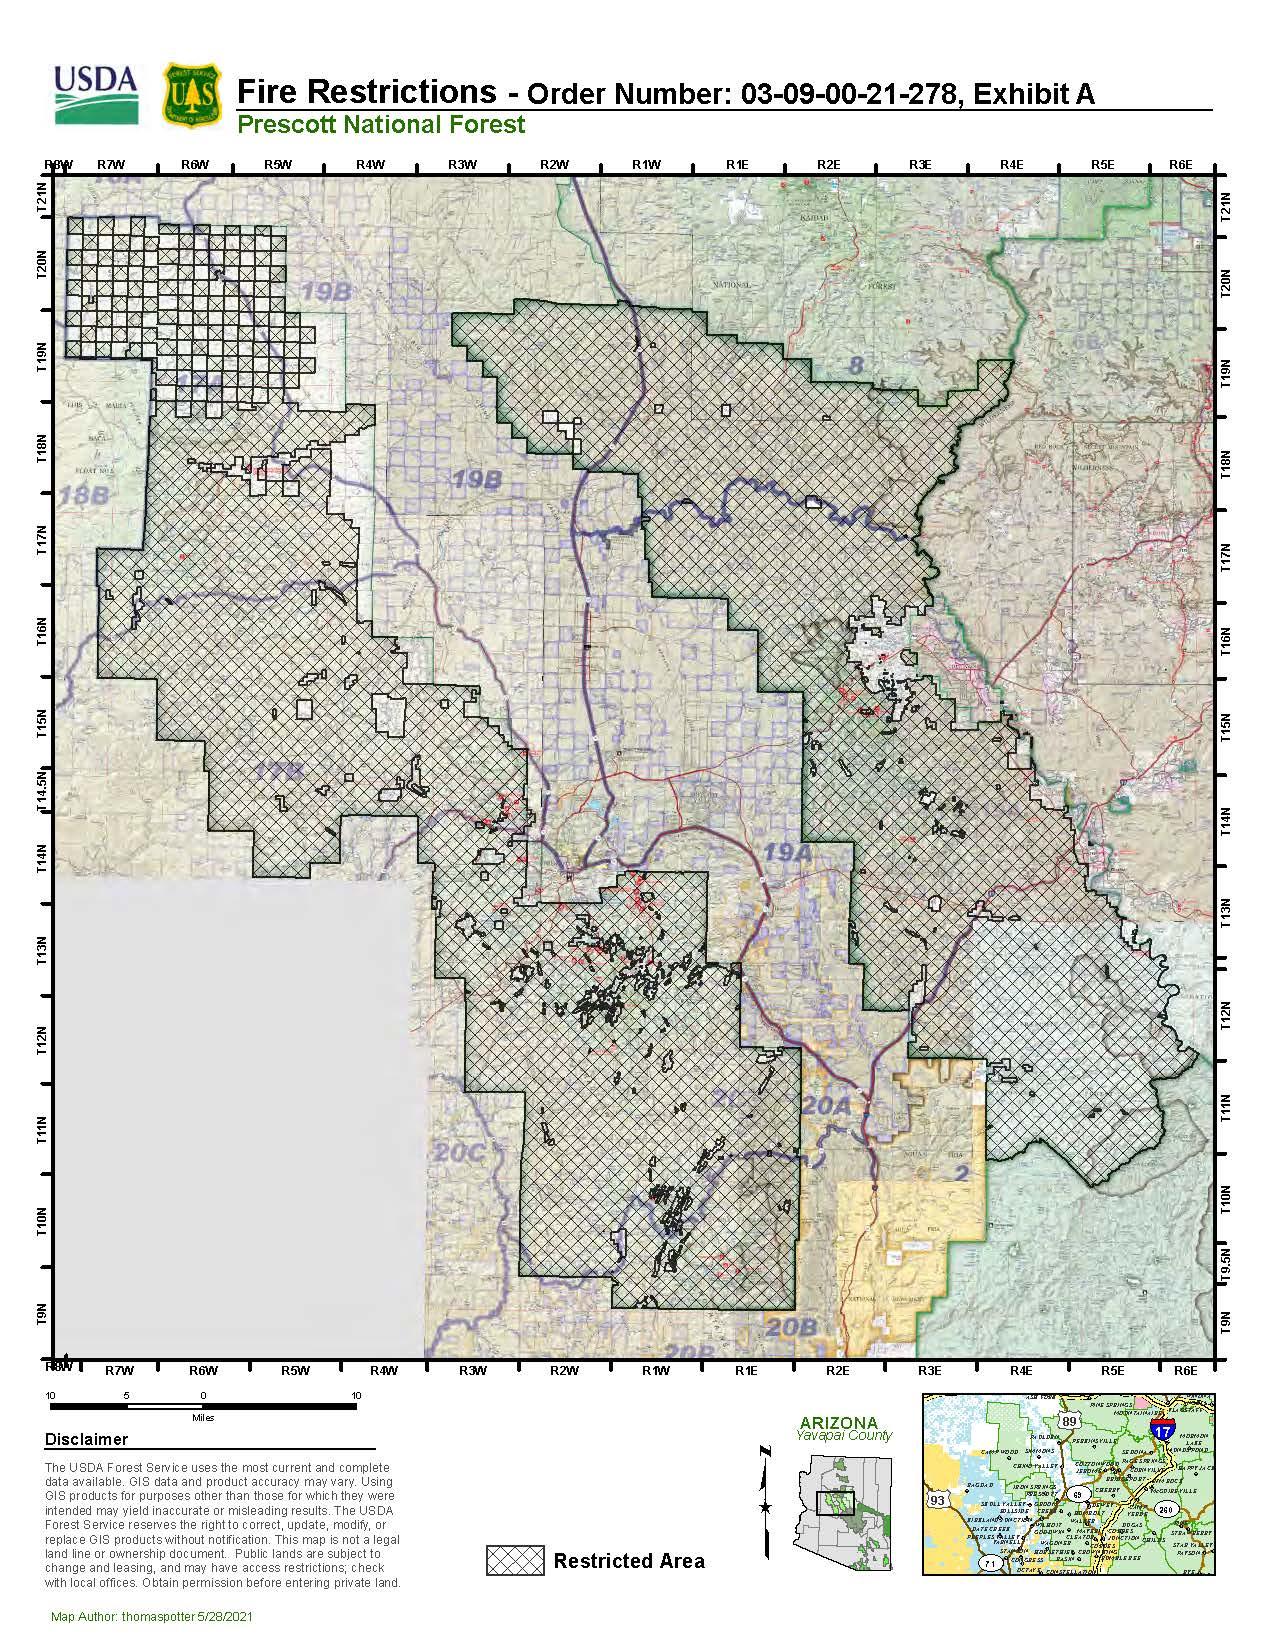 Prescott National Forest Restrictions Map